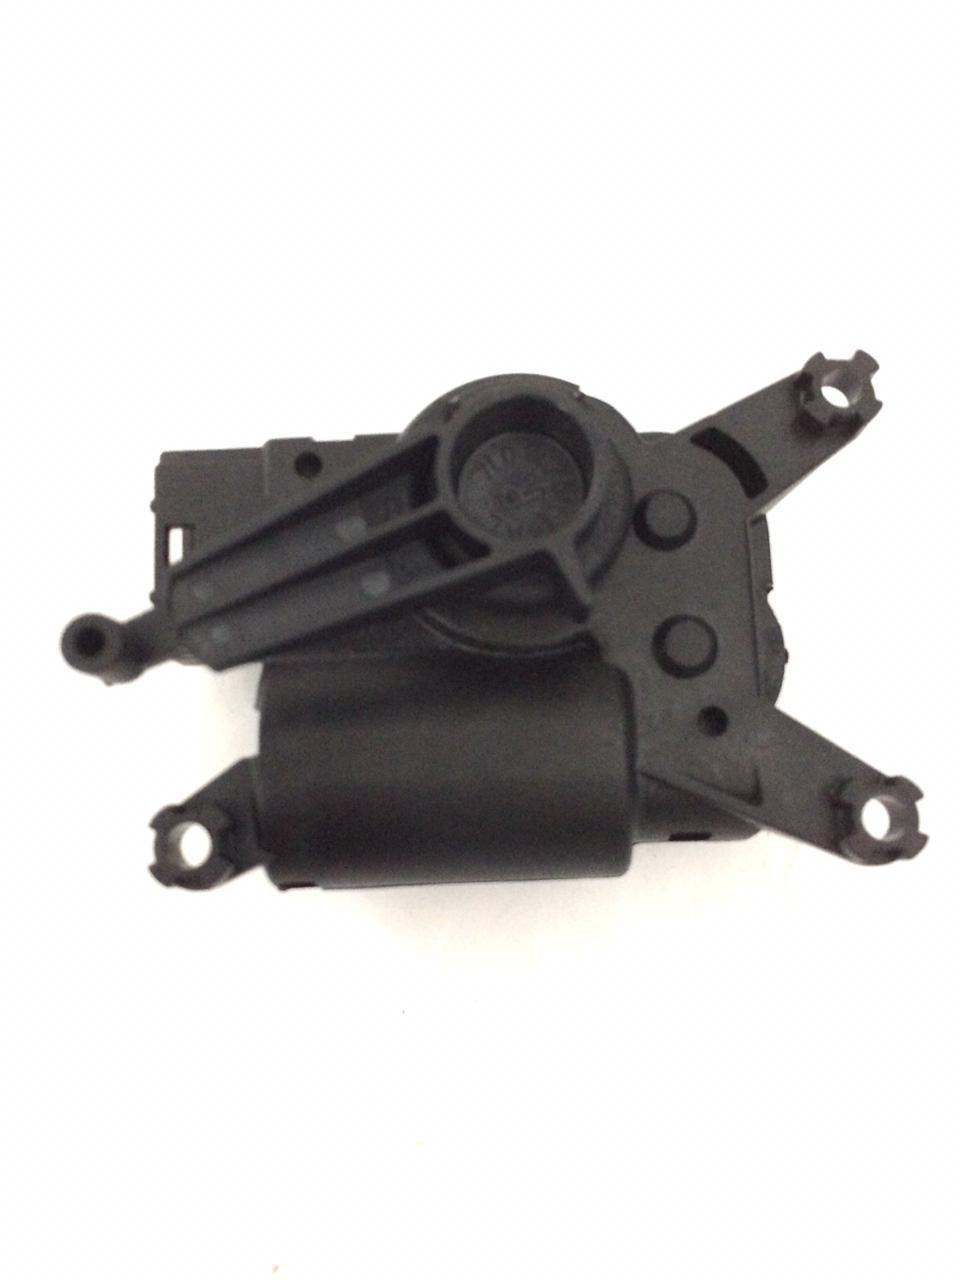 Motor de Ajuste Caixa de Ar Vw Amarok Touareg 7L0907511AL